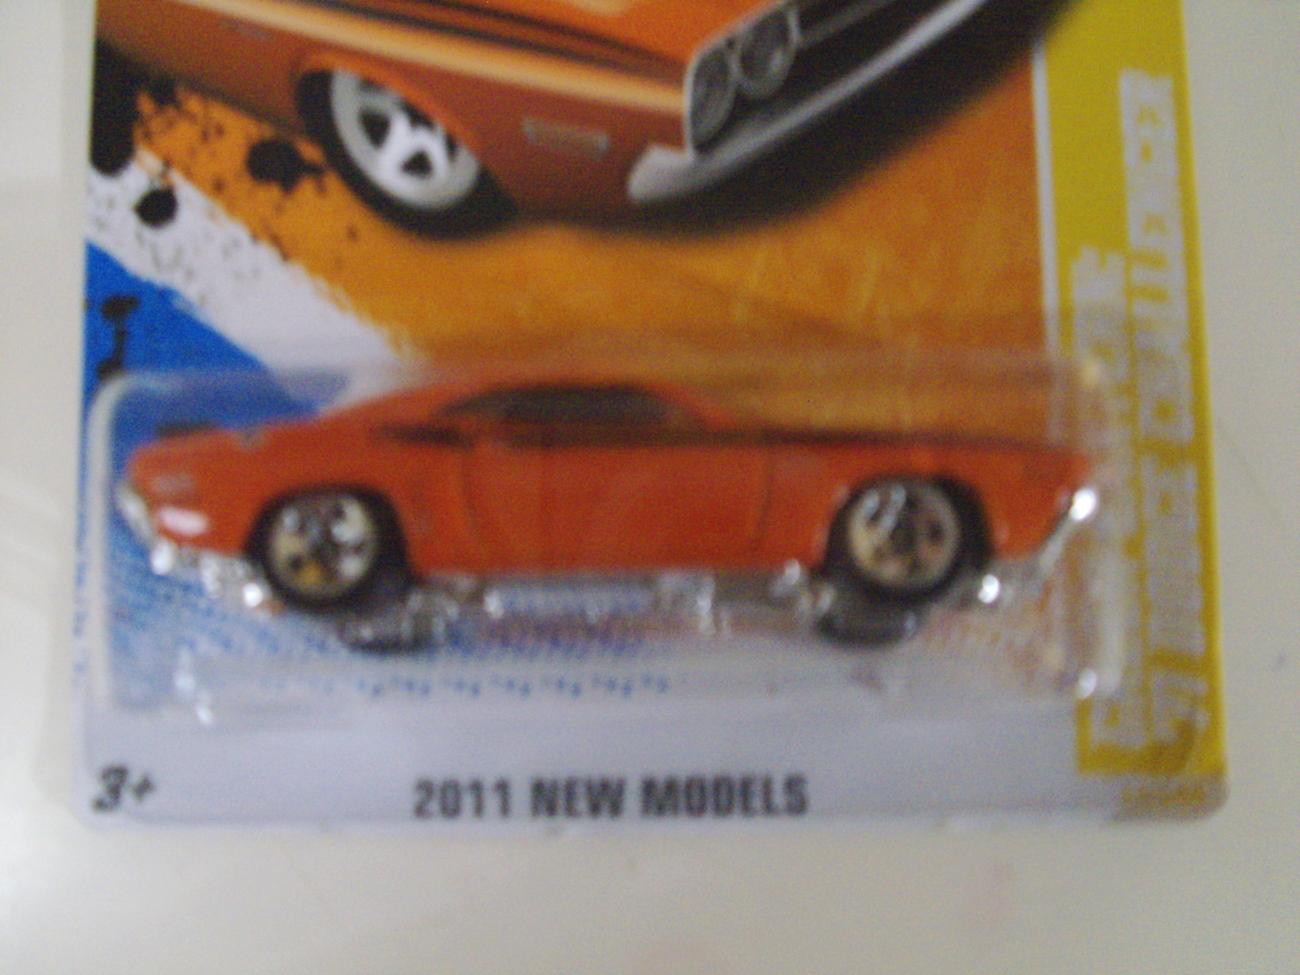 2011 New Models Hot Wheels Green Lantern '71 Dodge Challenger car - New